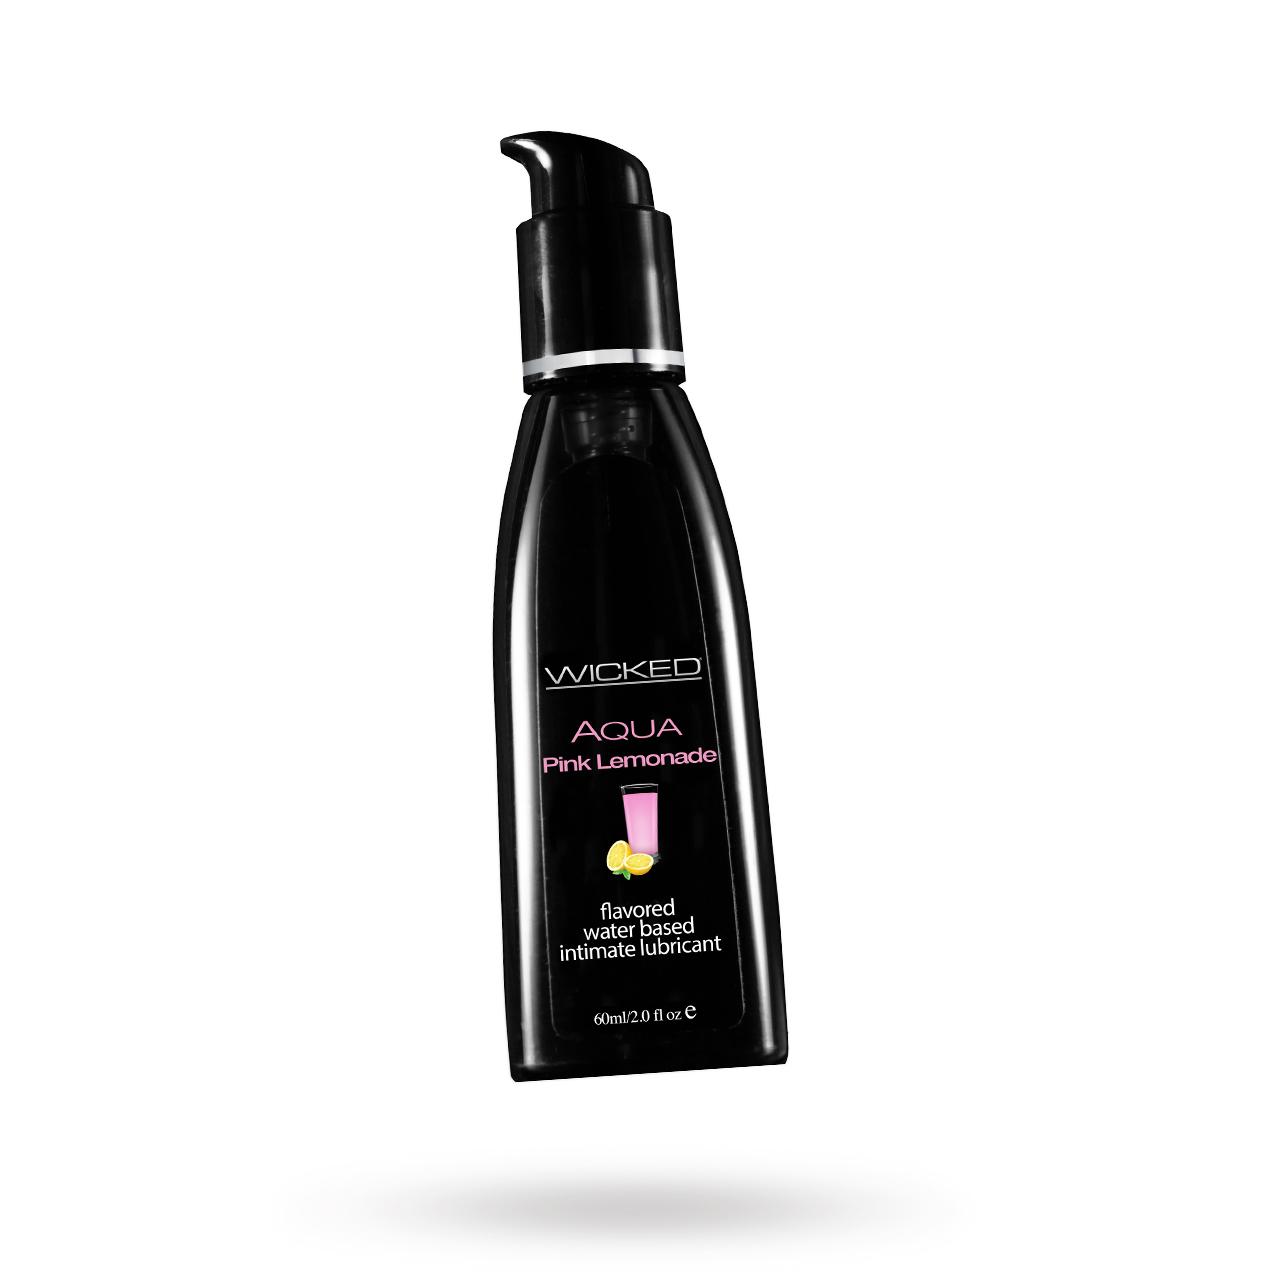 AQUA Pink Lemonade | Brands, Wicked Sensual Care, GLIDMEDEL ETC., GLIDMEDEL, Vattenbaserade glidmedel | Intimast.se - Sexleksaker